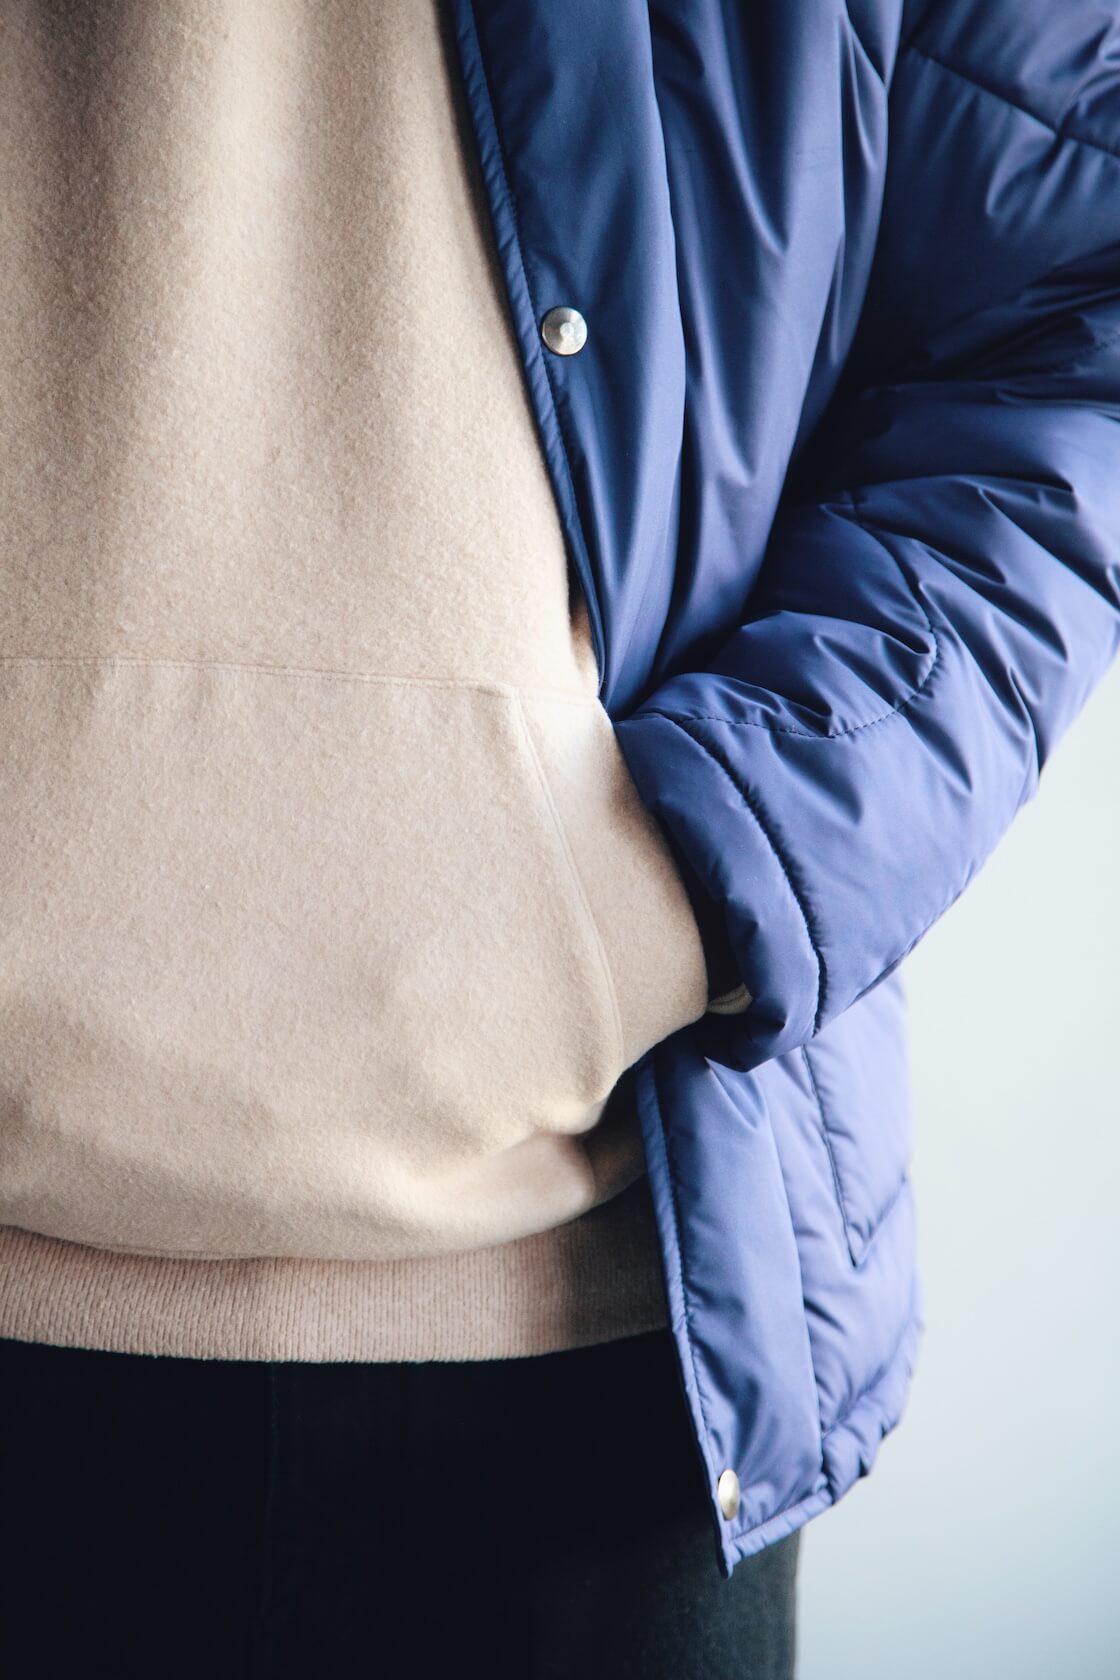 la paz barbosa padded jacket, la paz matias hoodie, harmony dorian jean on body